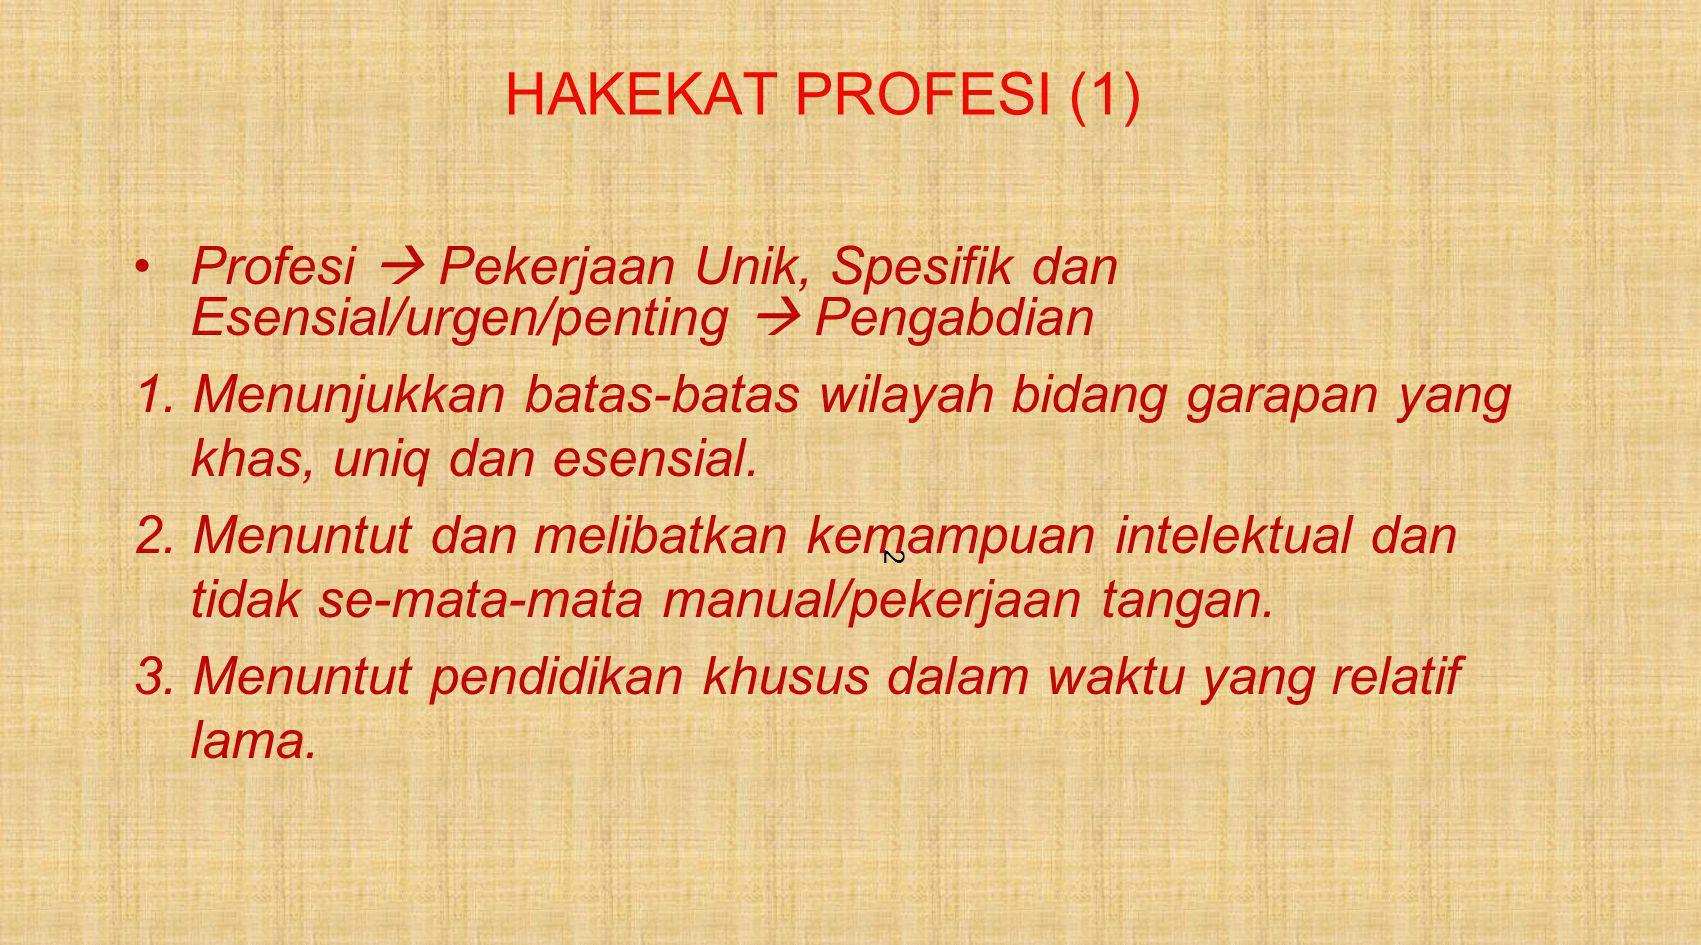 HAKEKAT PROFESI (1) Profesi  Pekerjaan Unik, Spesifik dan Esensial/urgen/penting  Pengabdian.